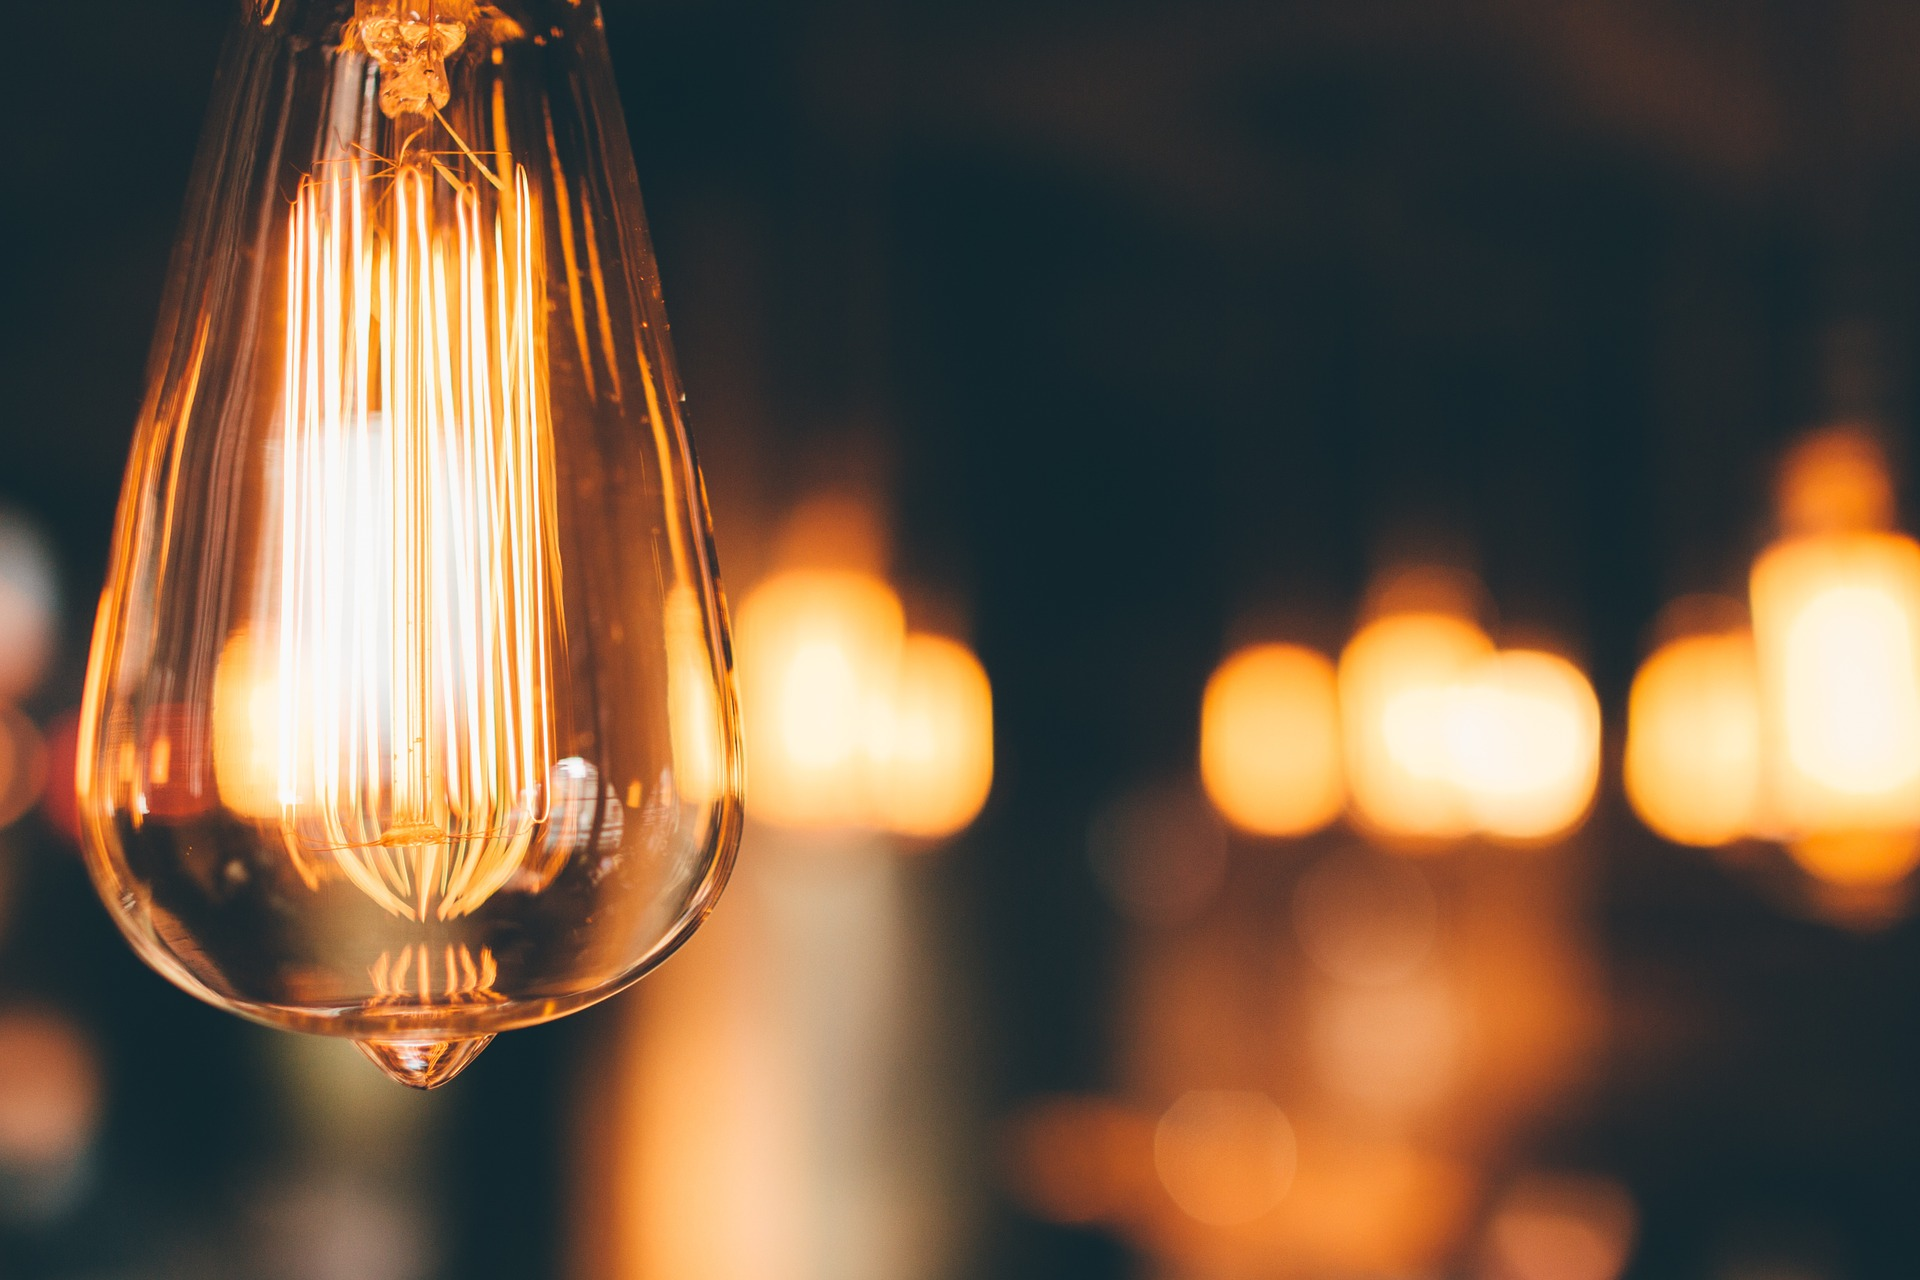 Restauranger belysning elinstallation